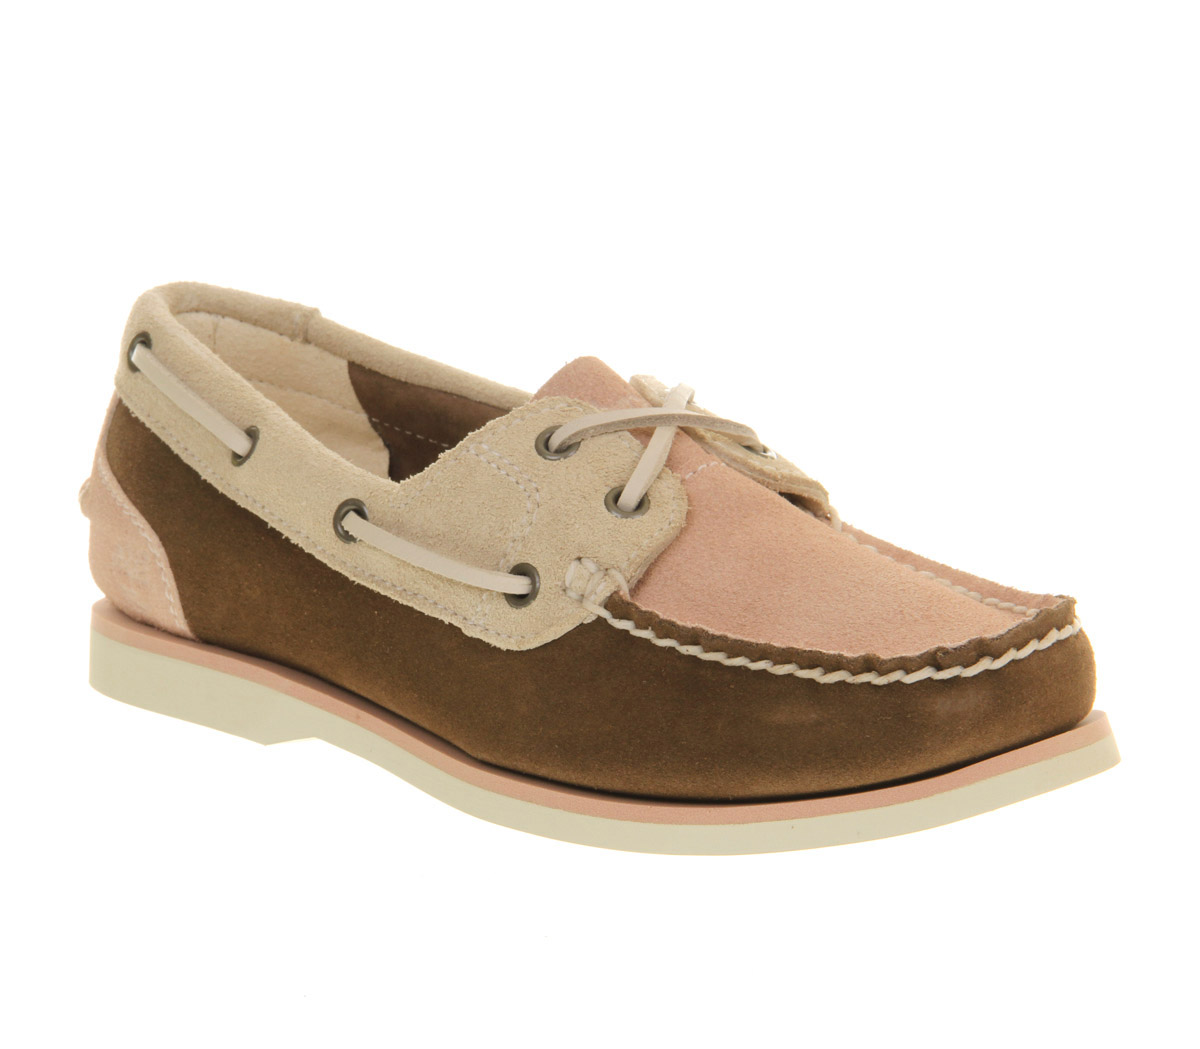 timberland loafers women